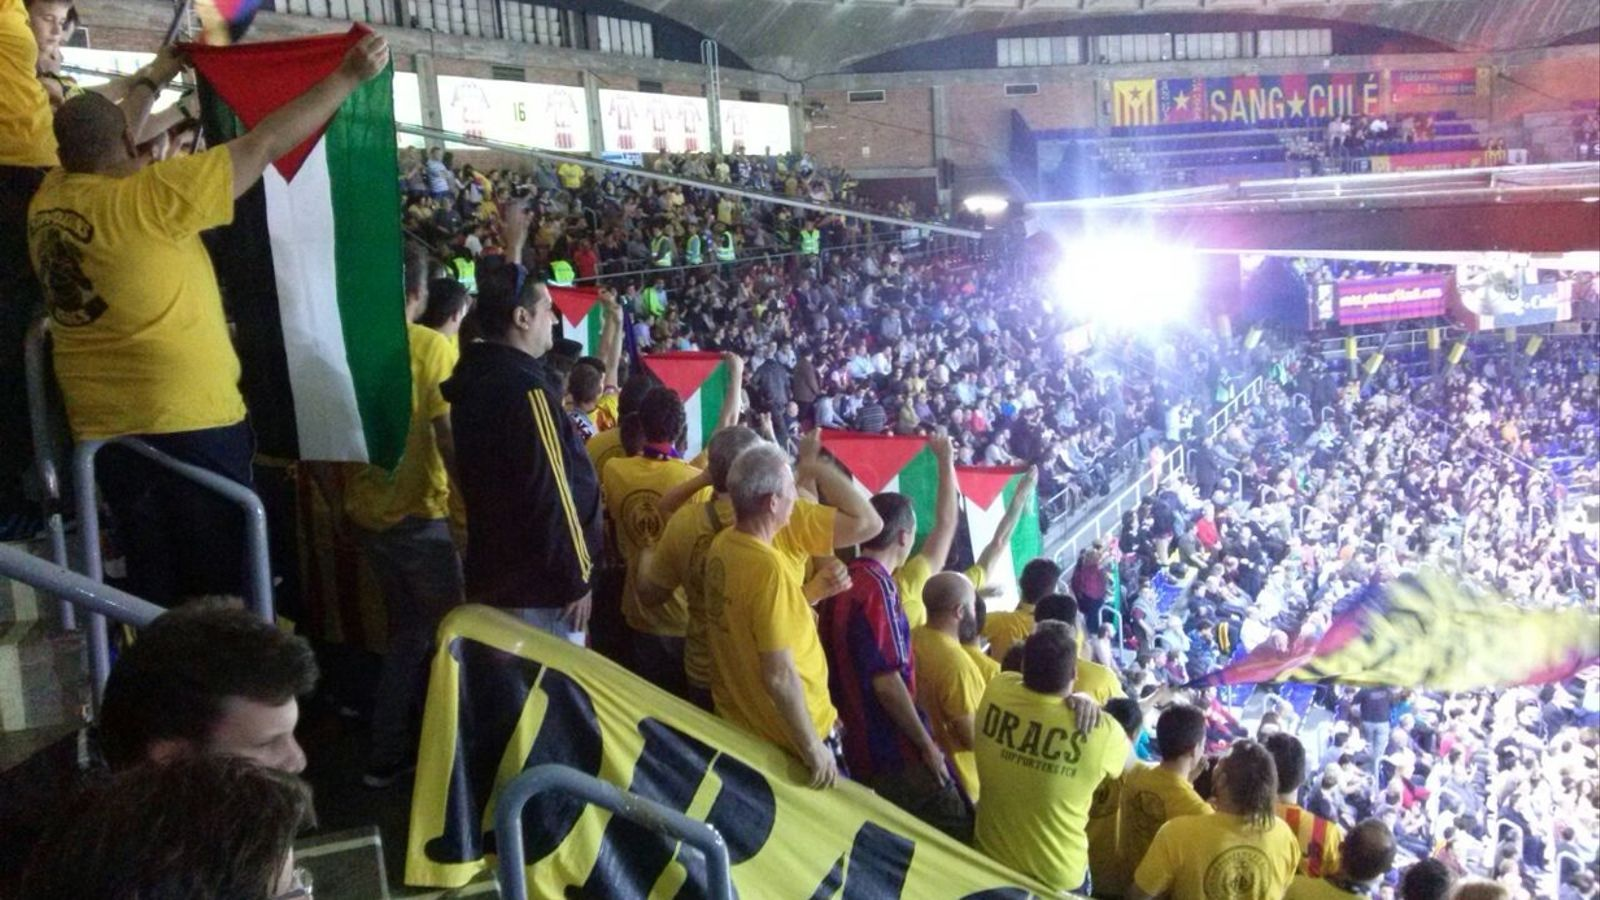 El palau blaugrana rep el maccabi amb banderes palestines for Puerta 0 palau blaugrana